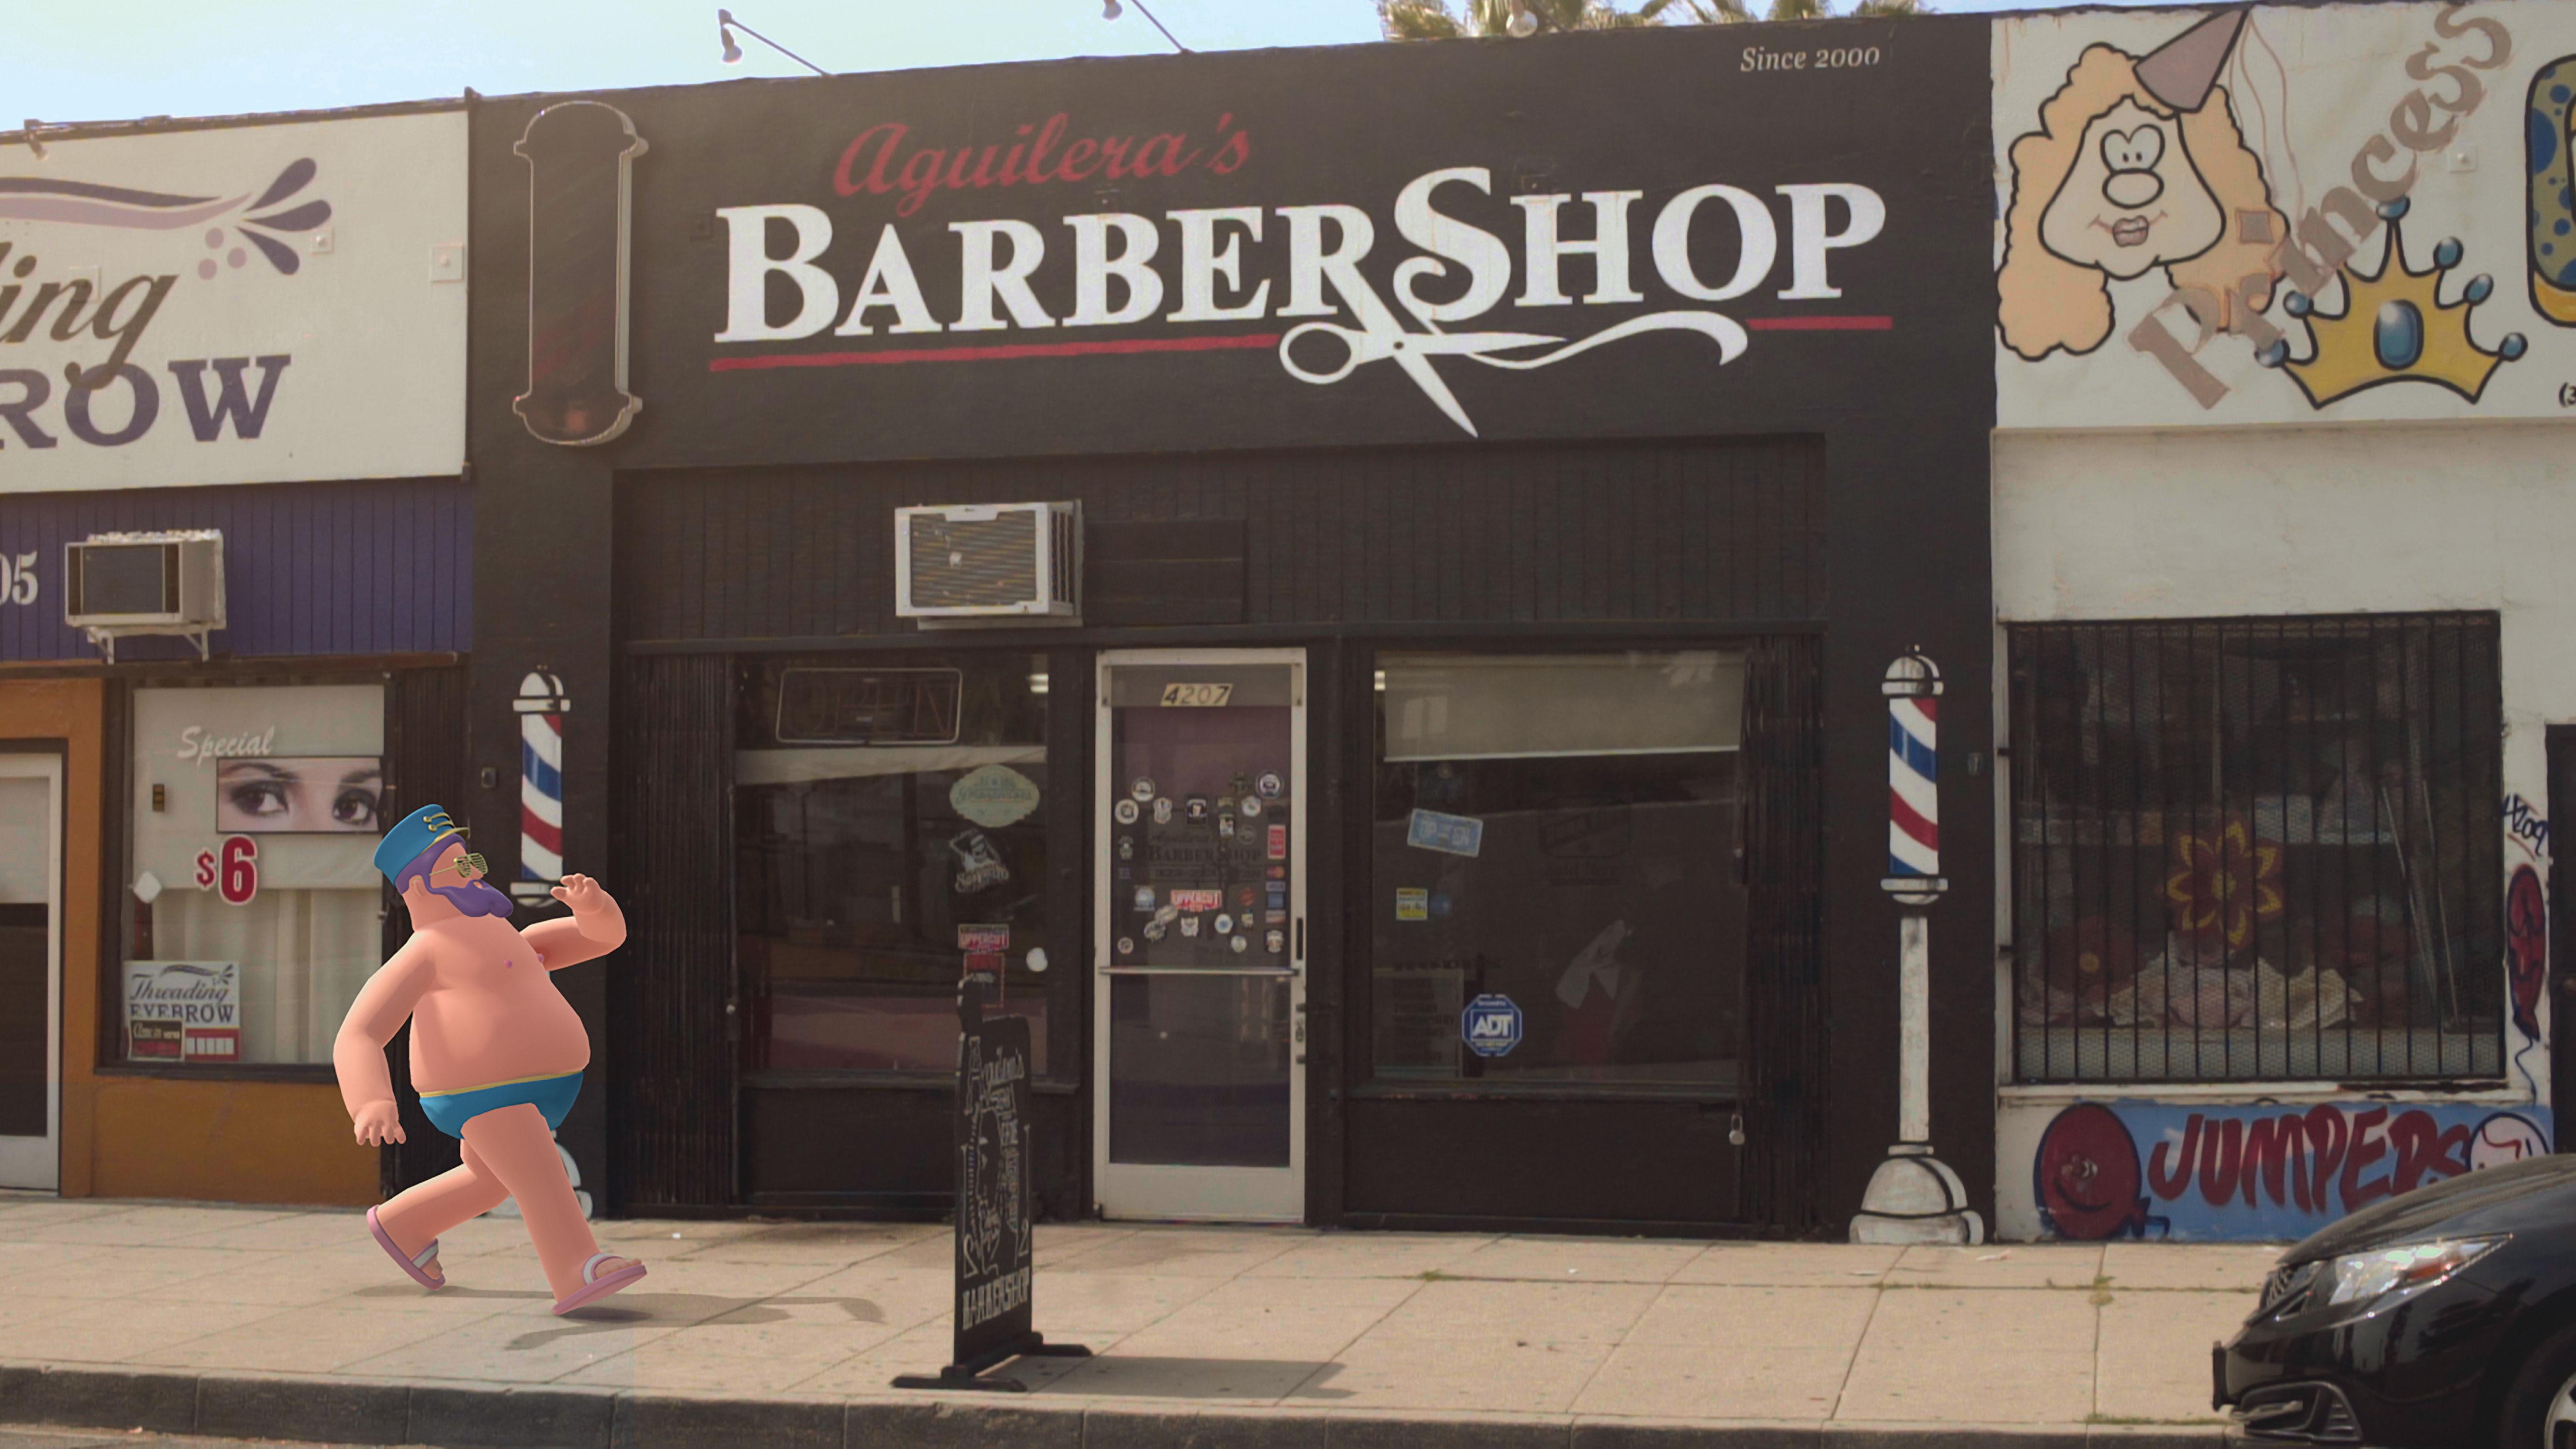 Nexus Studios' Hotstepper character walking past a barbershop